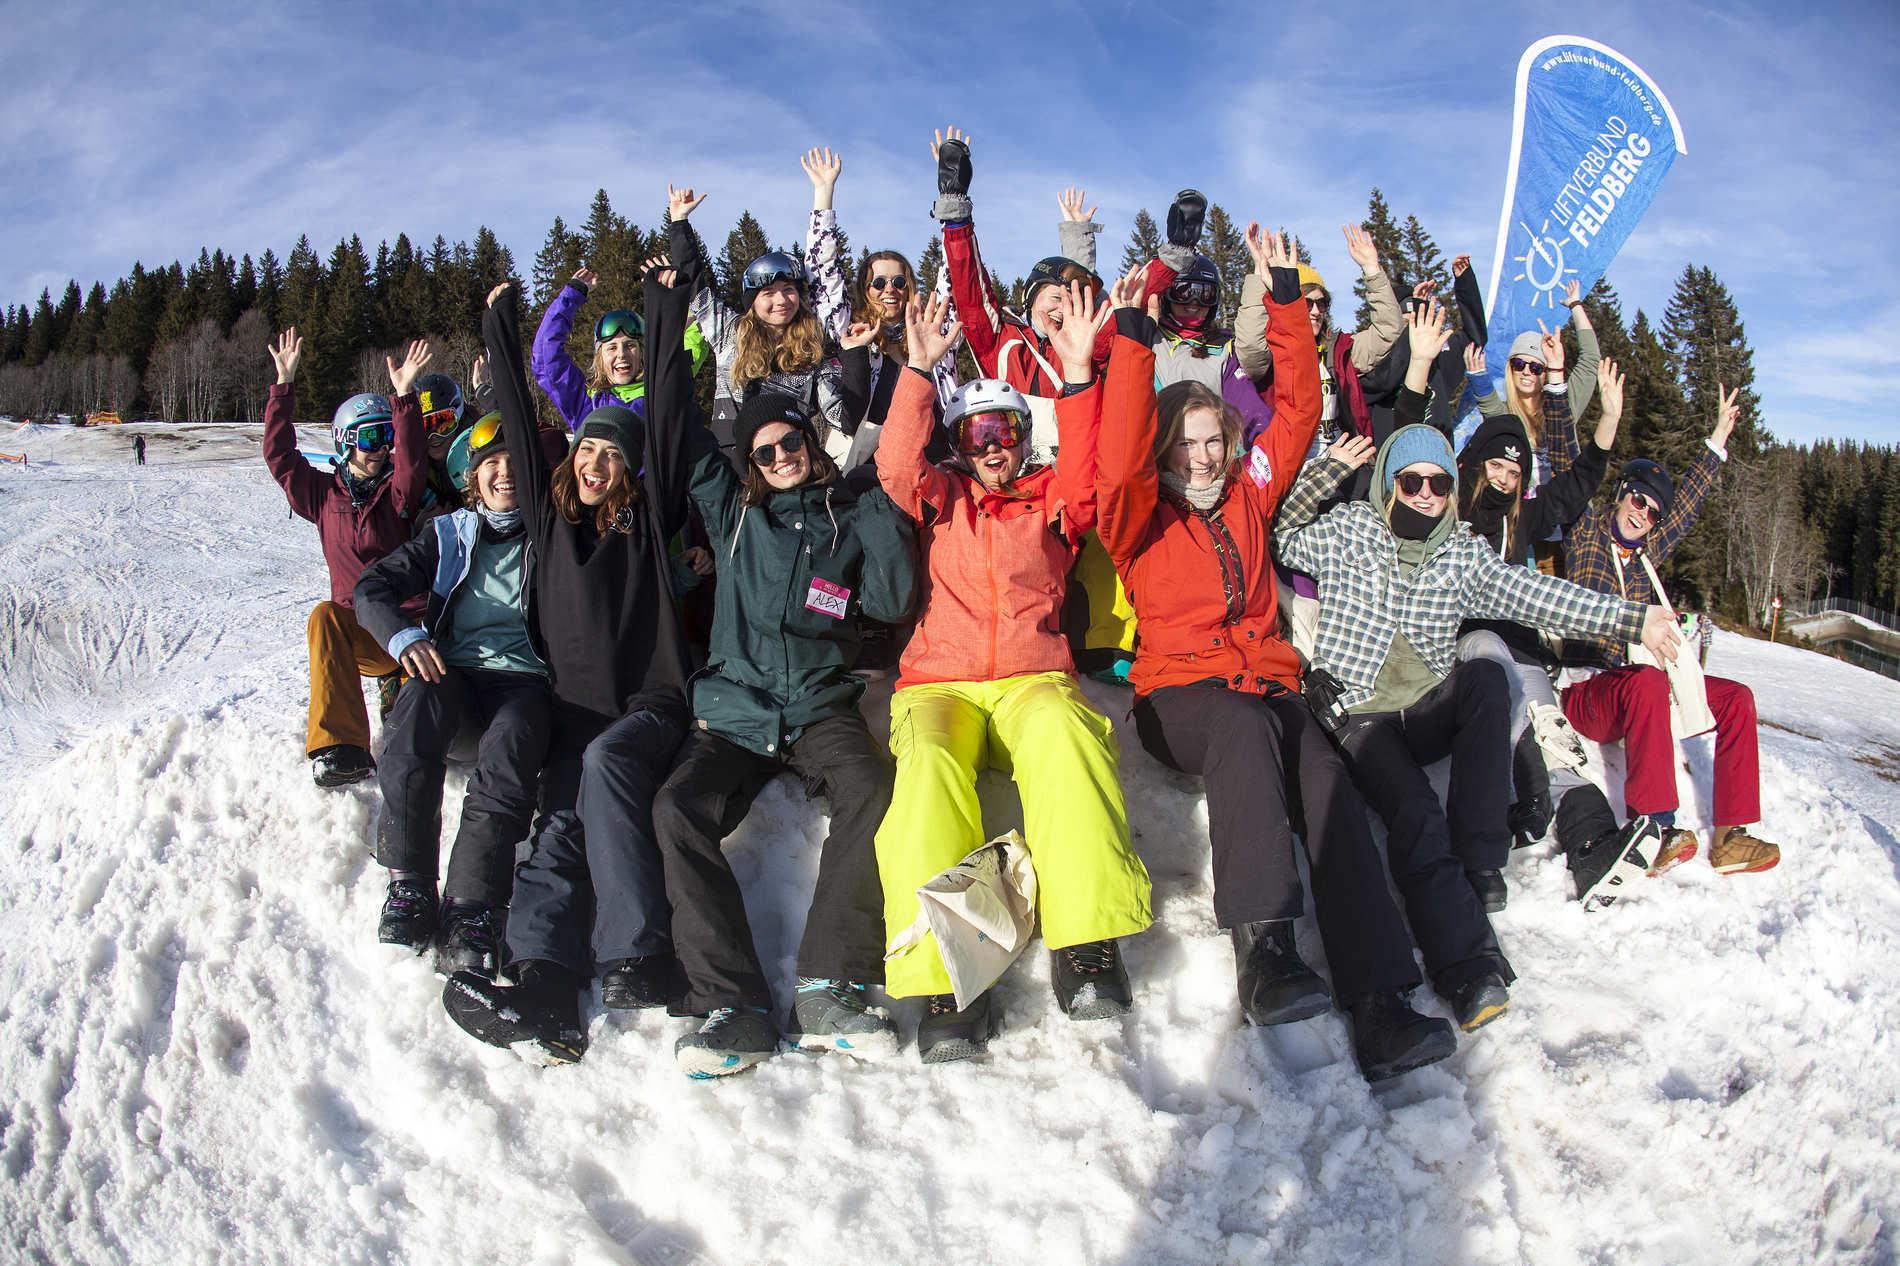 web snowpark feldberg 25 02 2017 lifestyle fs sb martin herrmann qparks 1